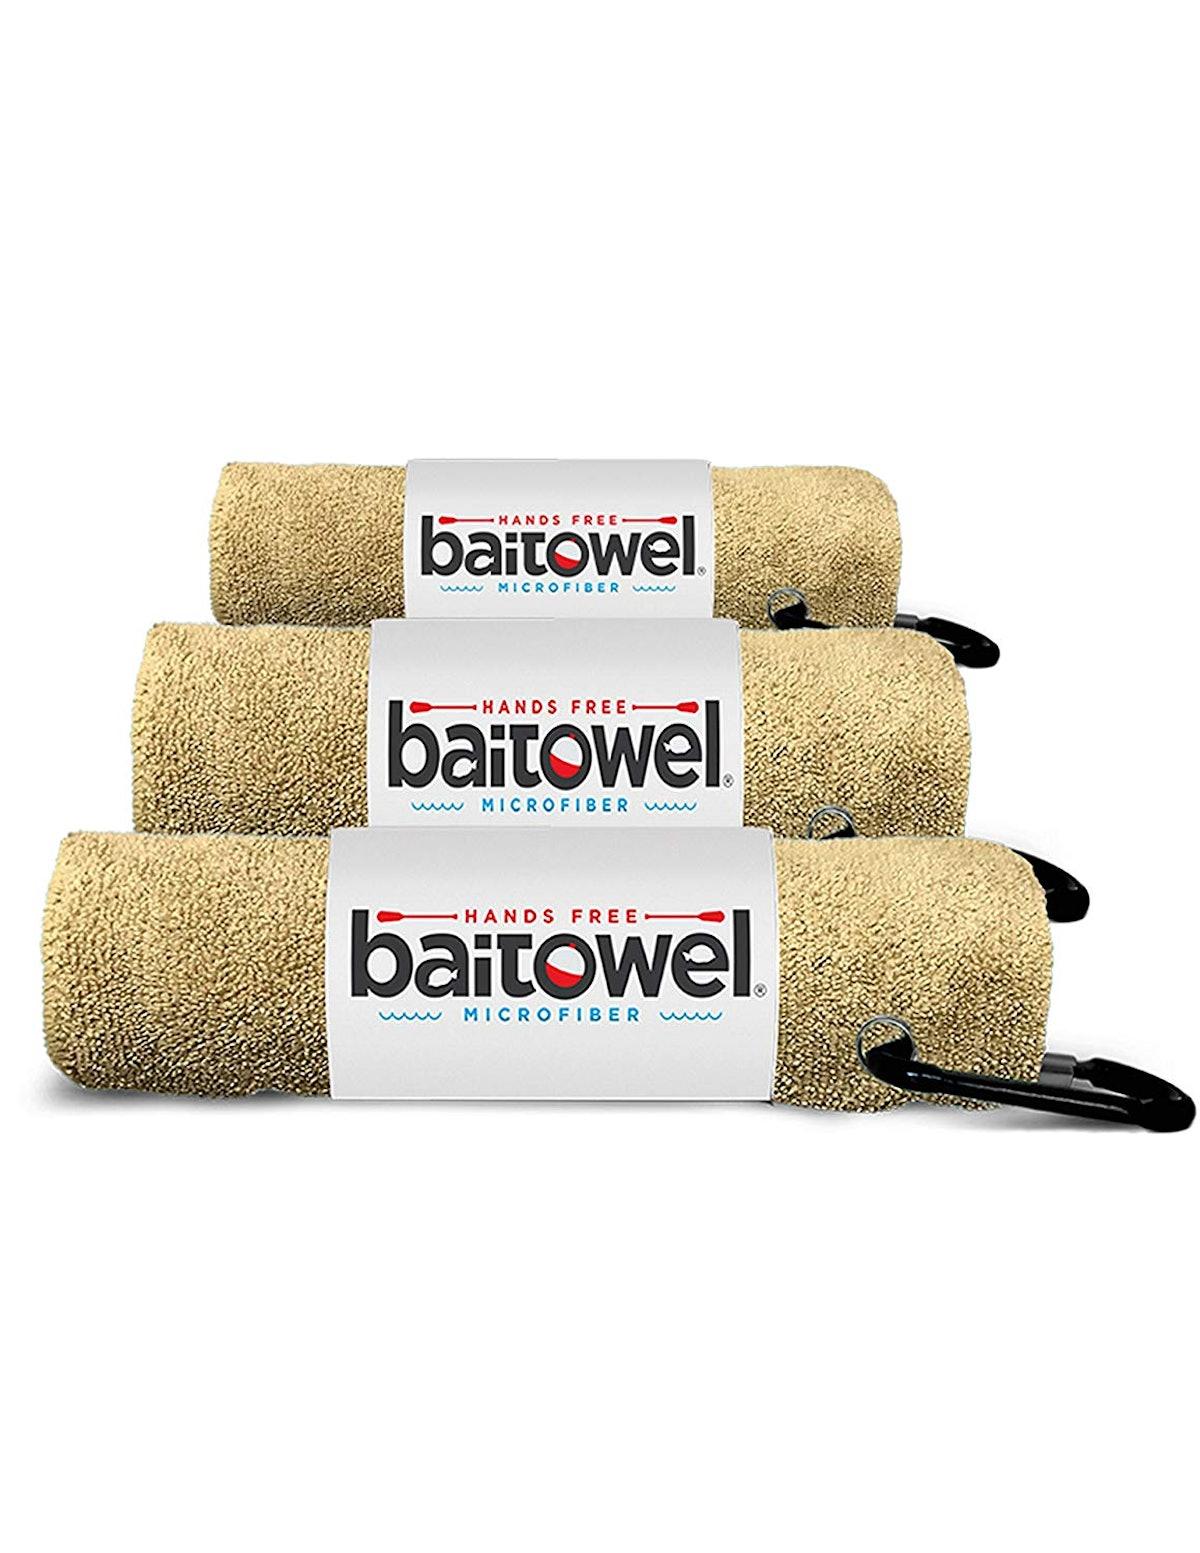 Bait Towel Microfiber Towel (3-Pack)